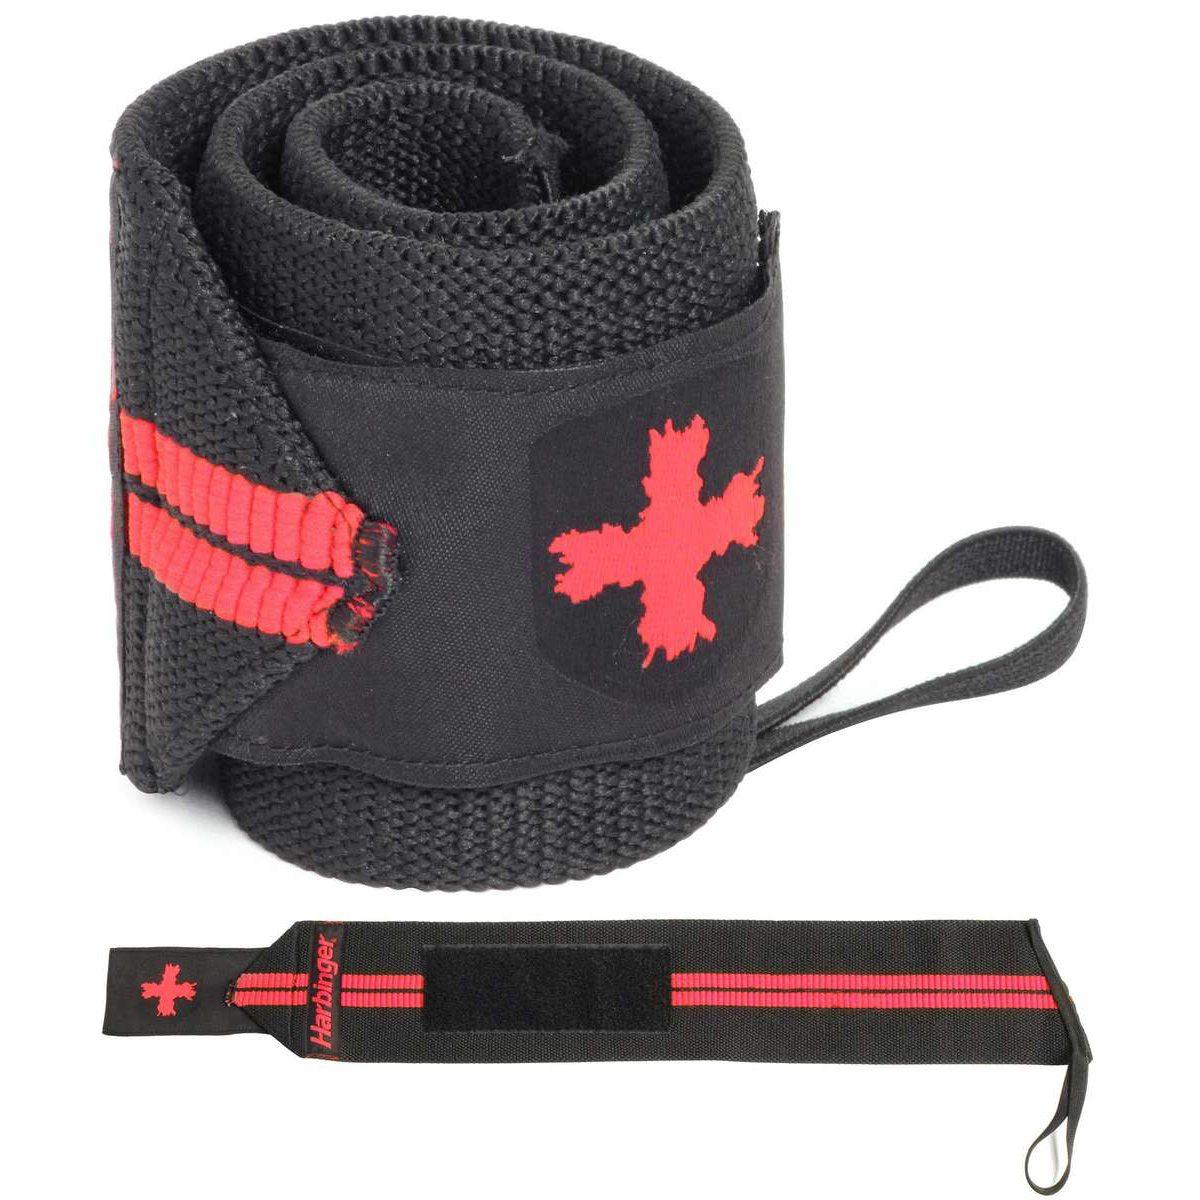 Wrist-Wraps-Red-Line-18-Inch---Harbinger